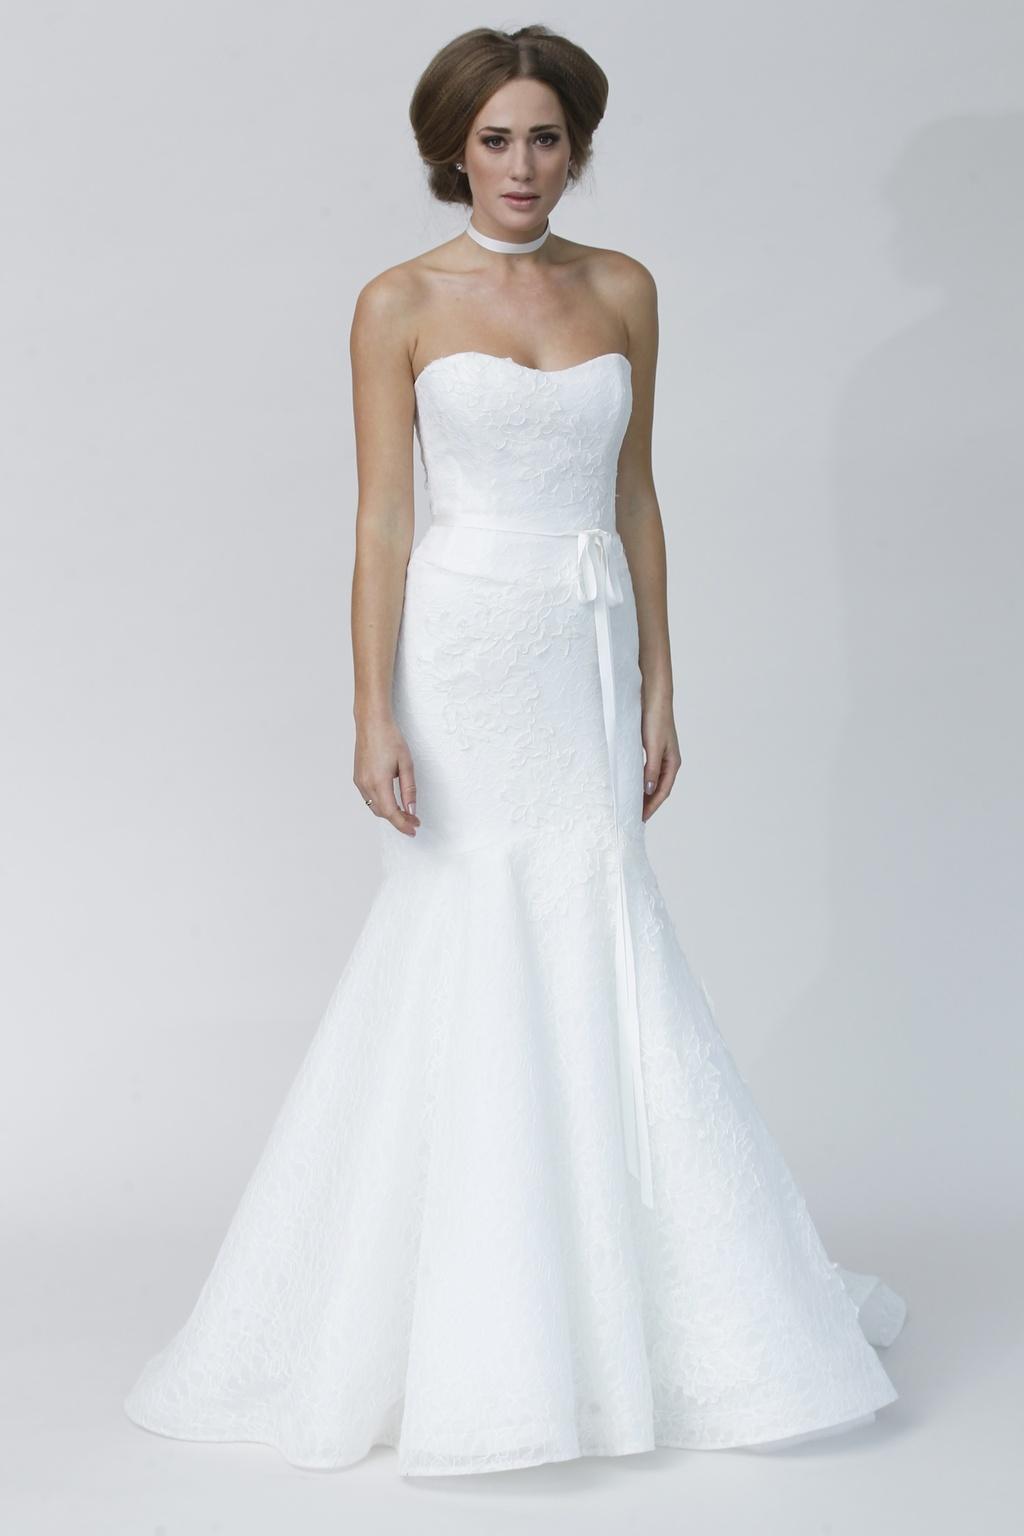 Valentina-wedding-dress-by-rivini-fall-2014-bridal.full